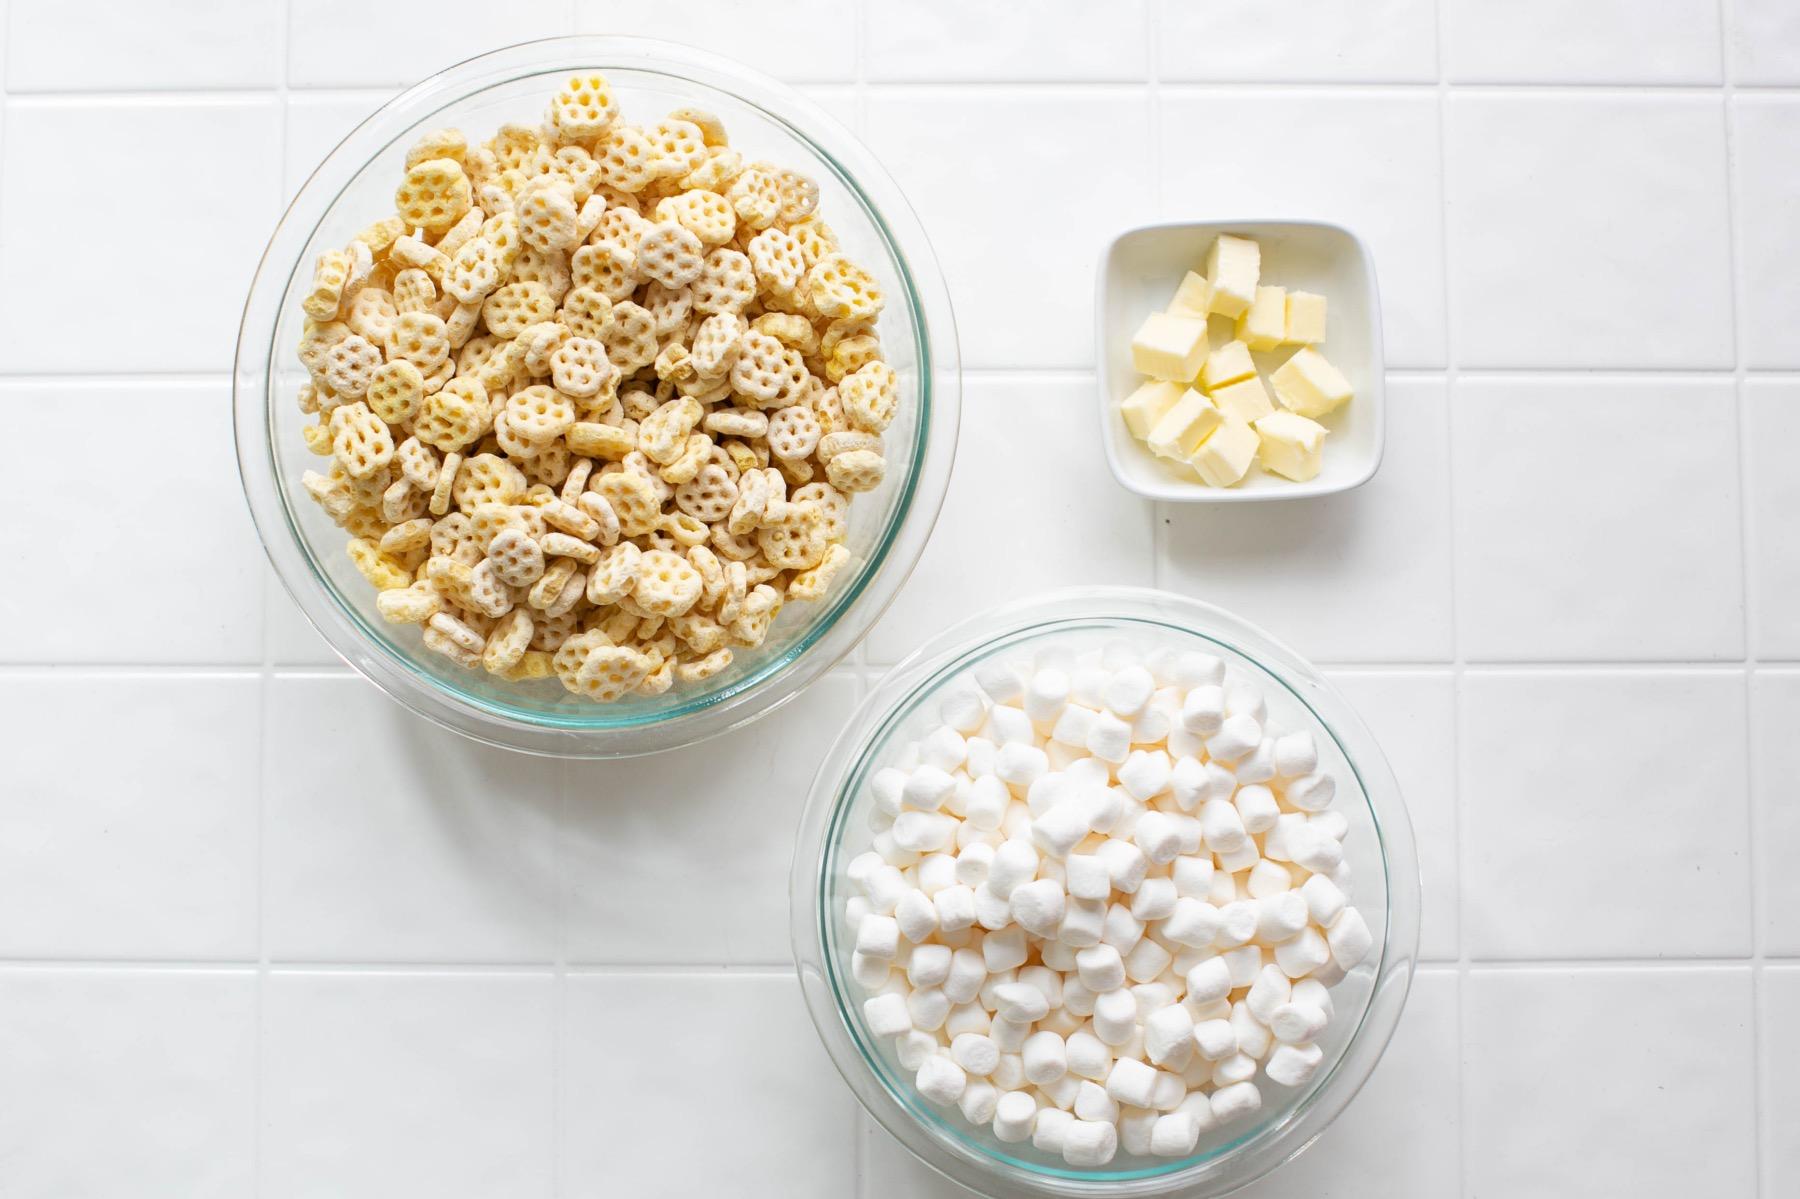 ingredients to make honeycomb marshmallow crispy treats